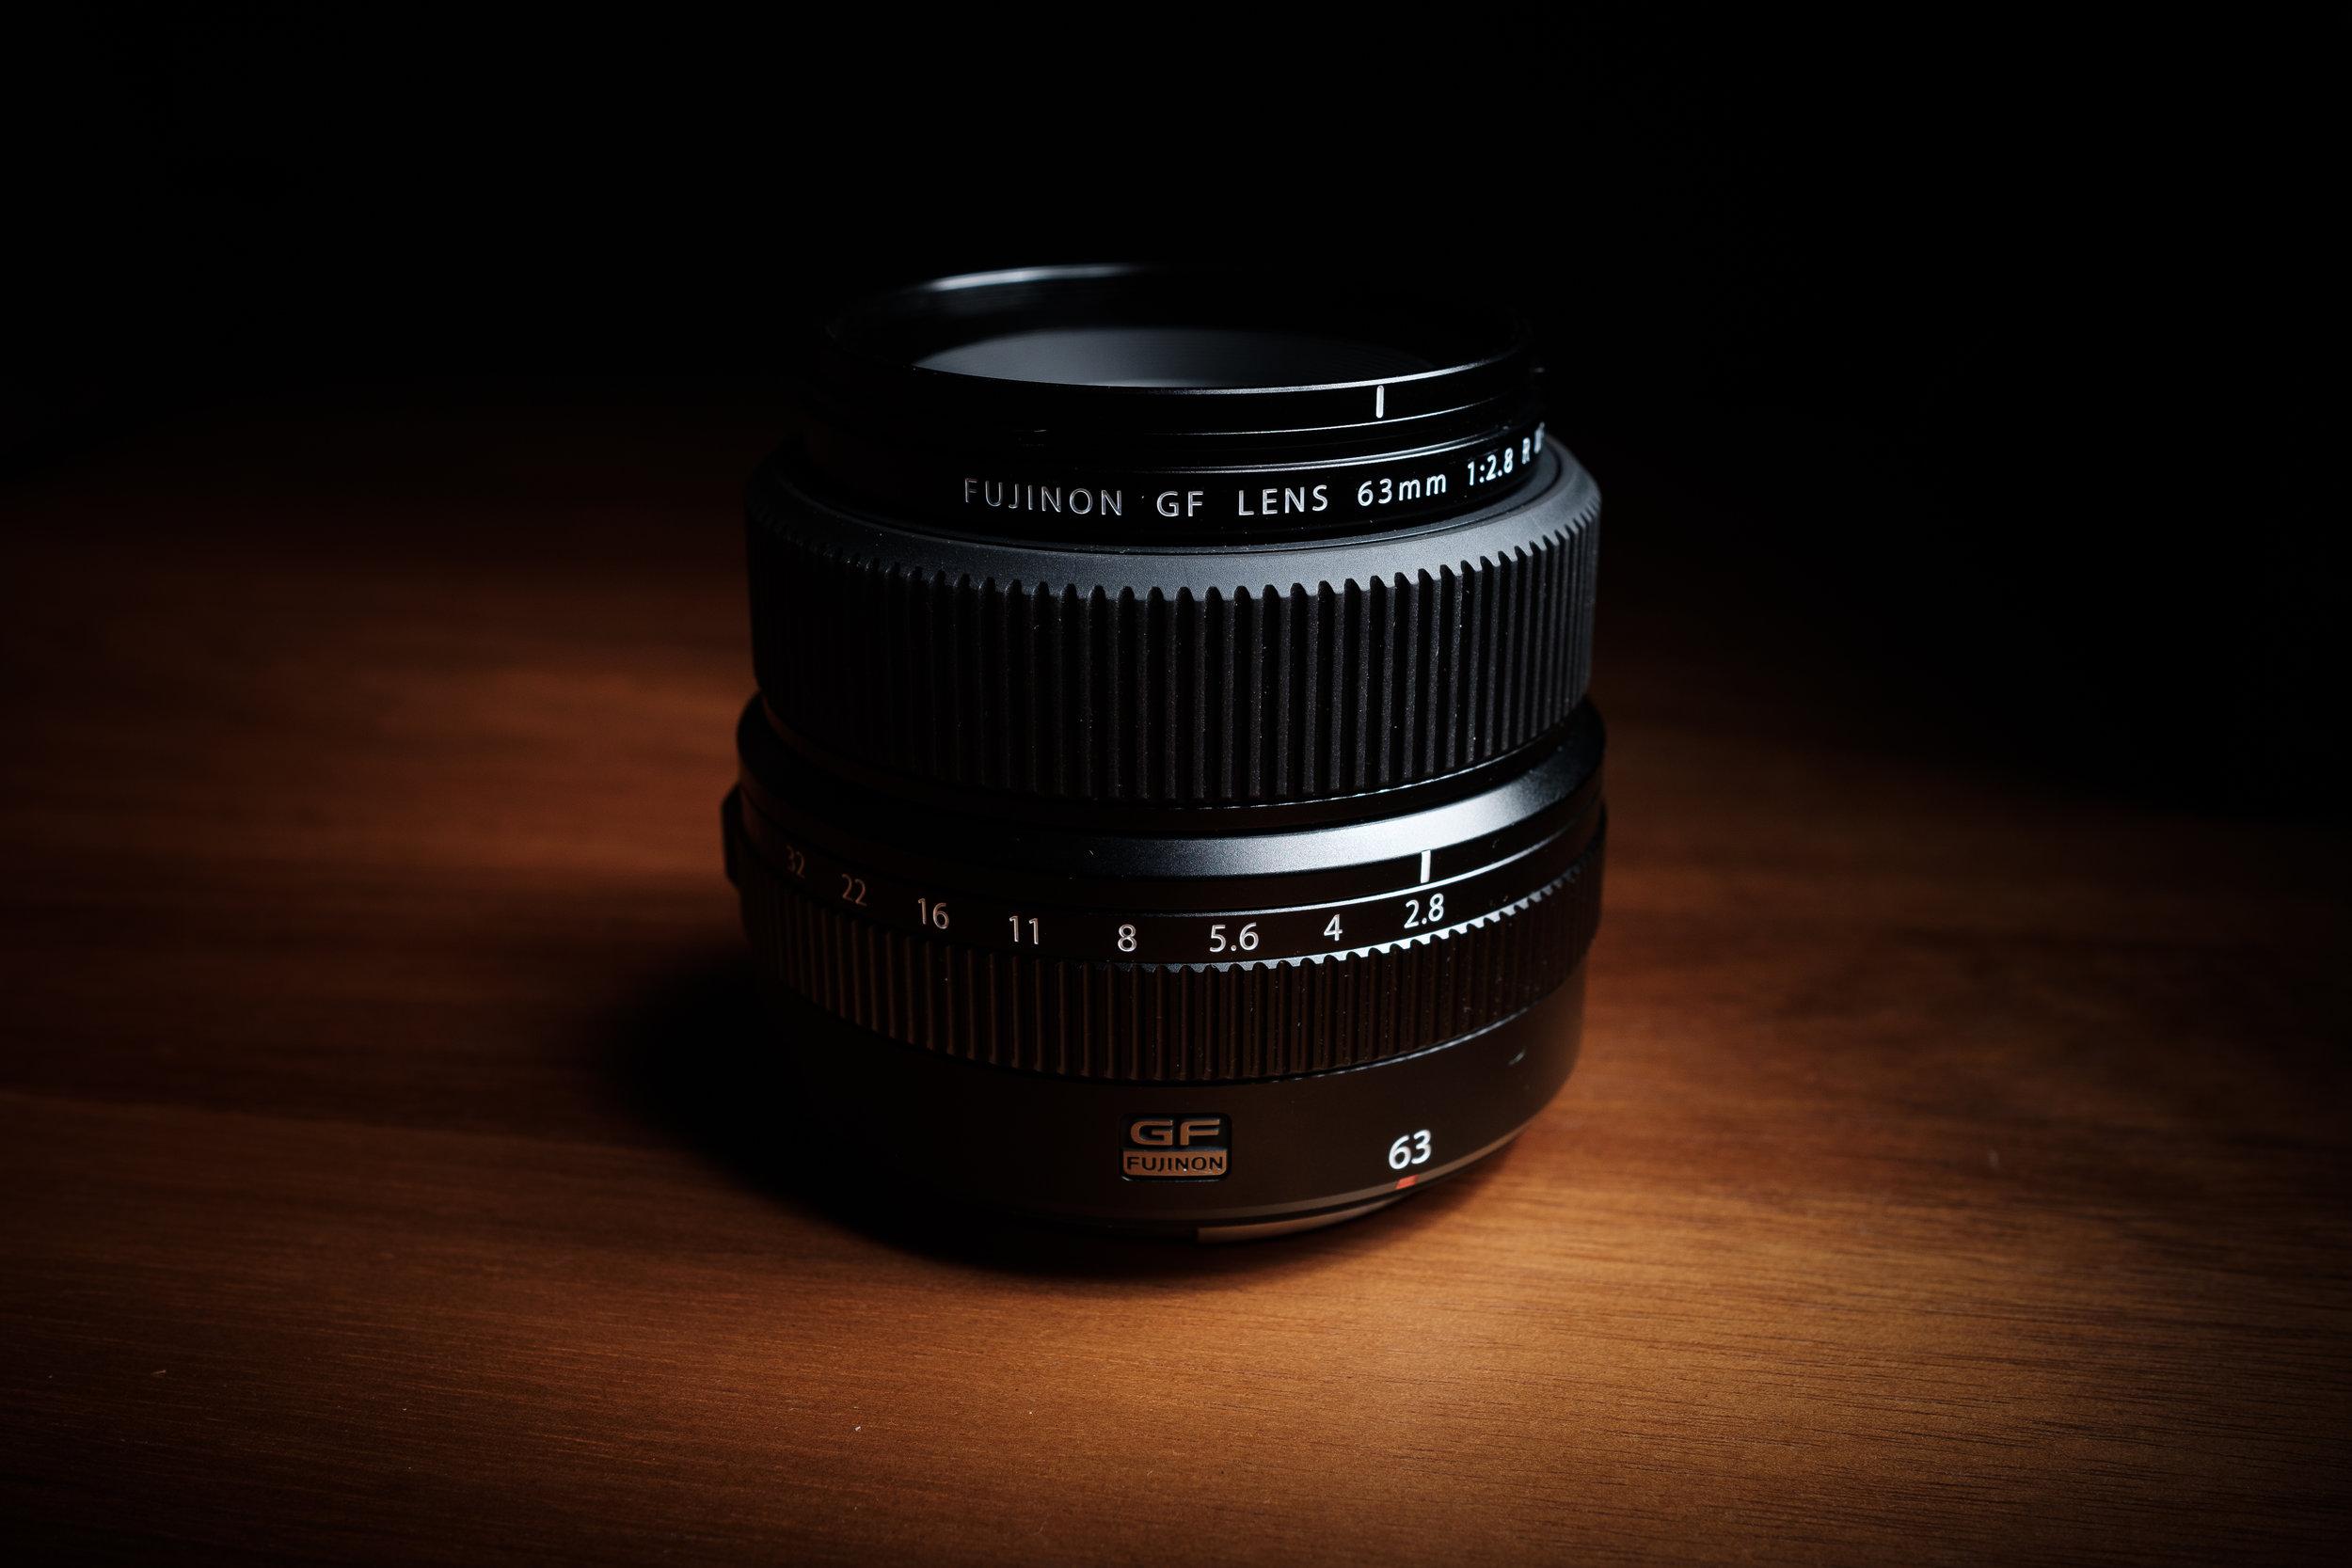 Fujifilm 63mm f2.8